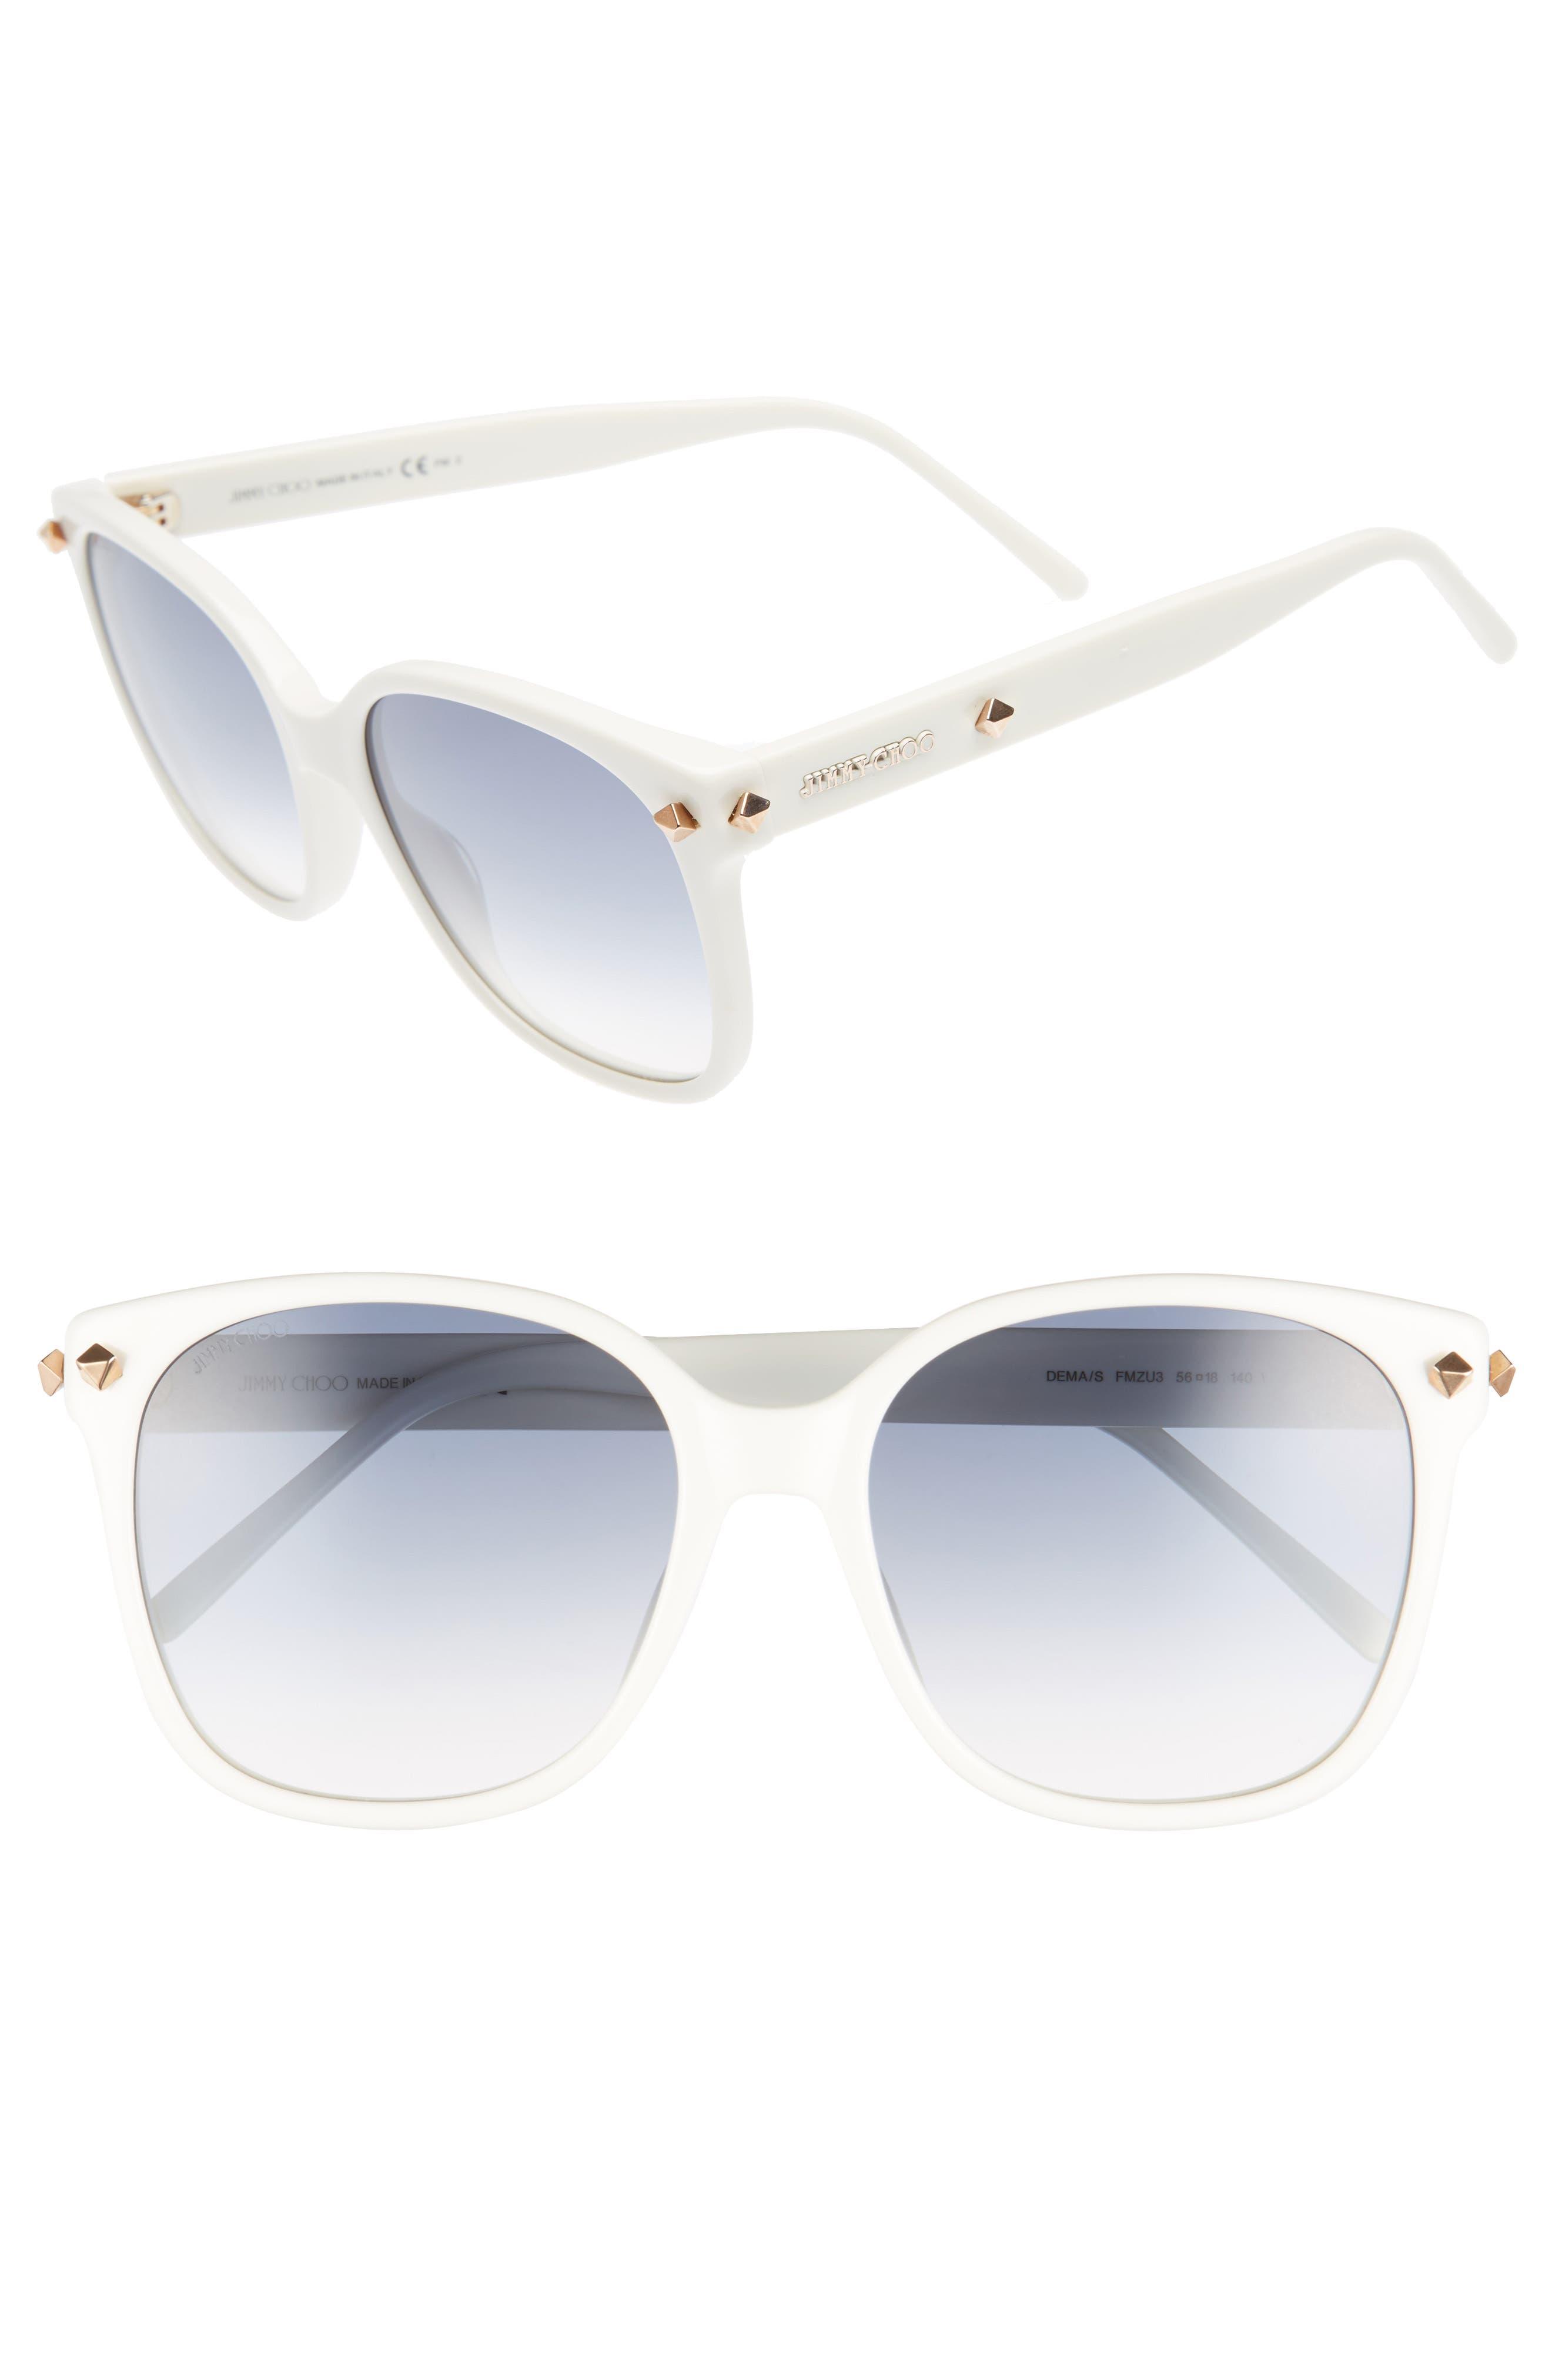 Alternate Image 1 Selected - Jimmy Choo Demas 56mm Sunglasses